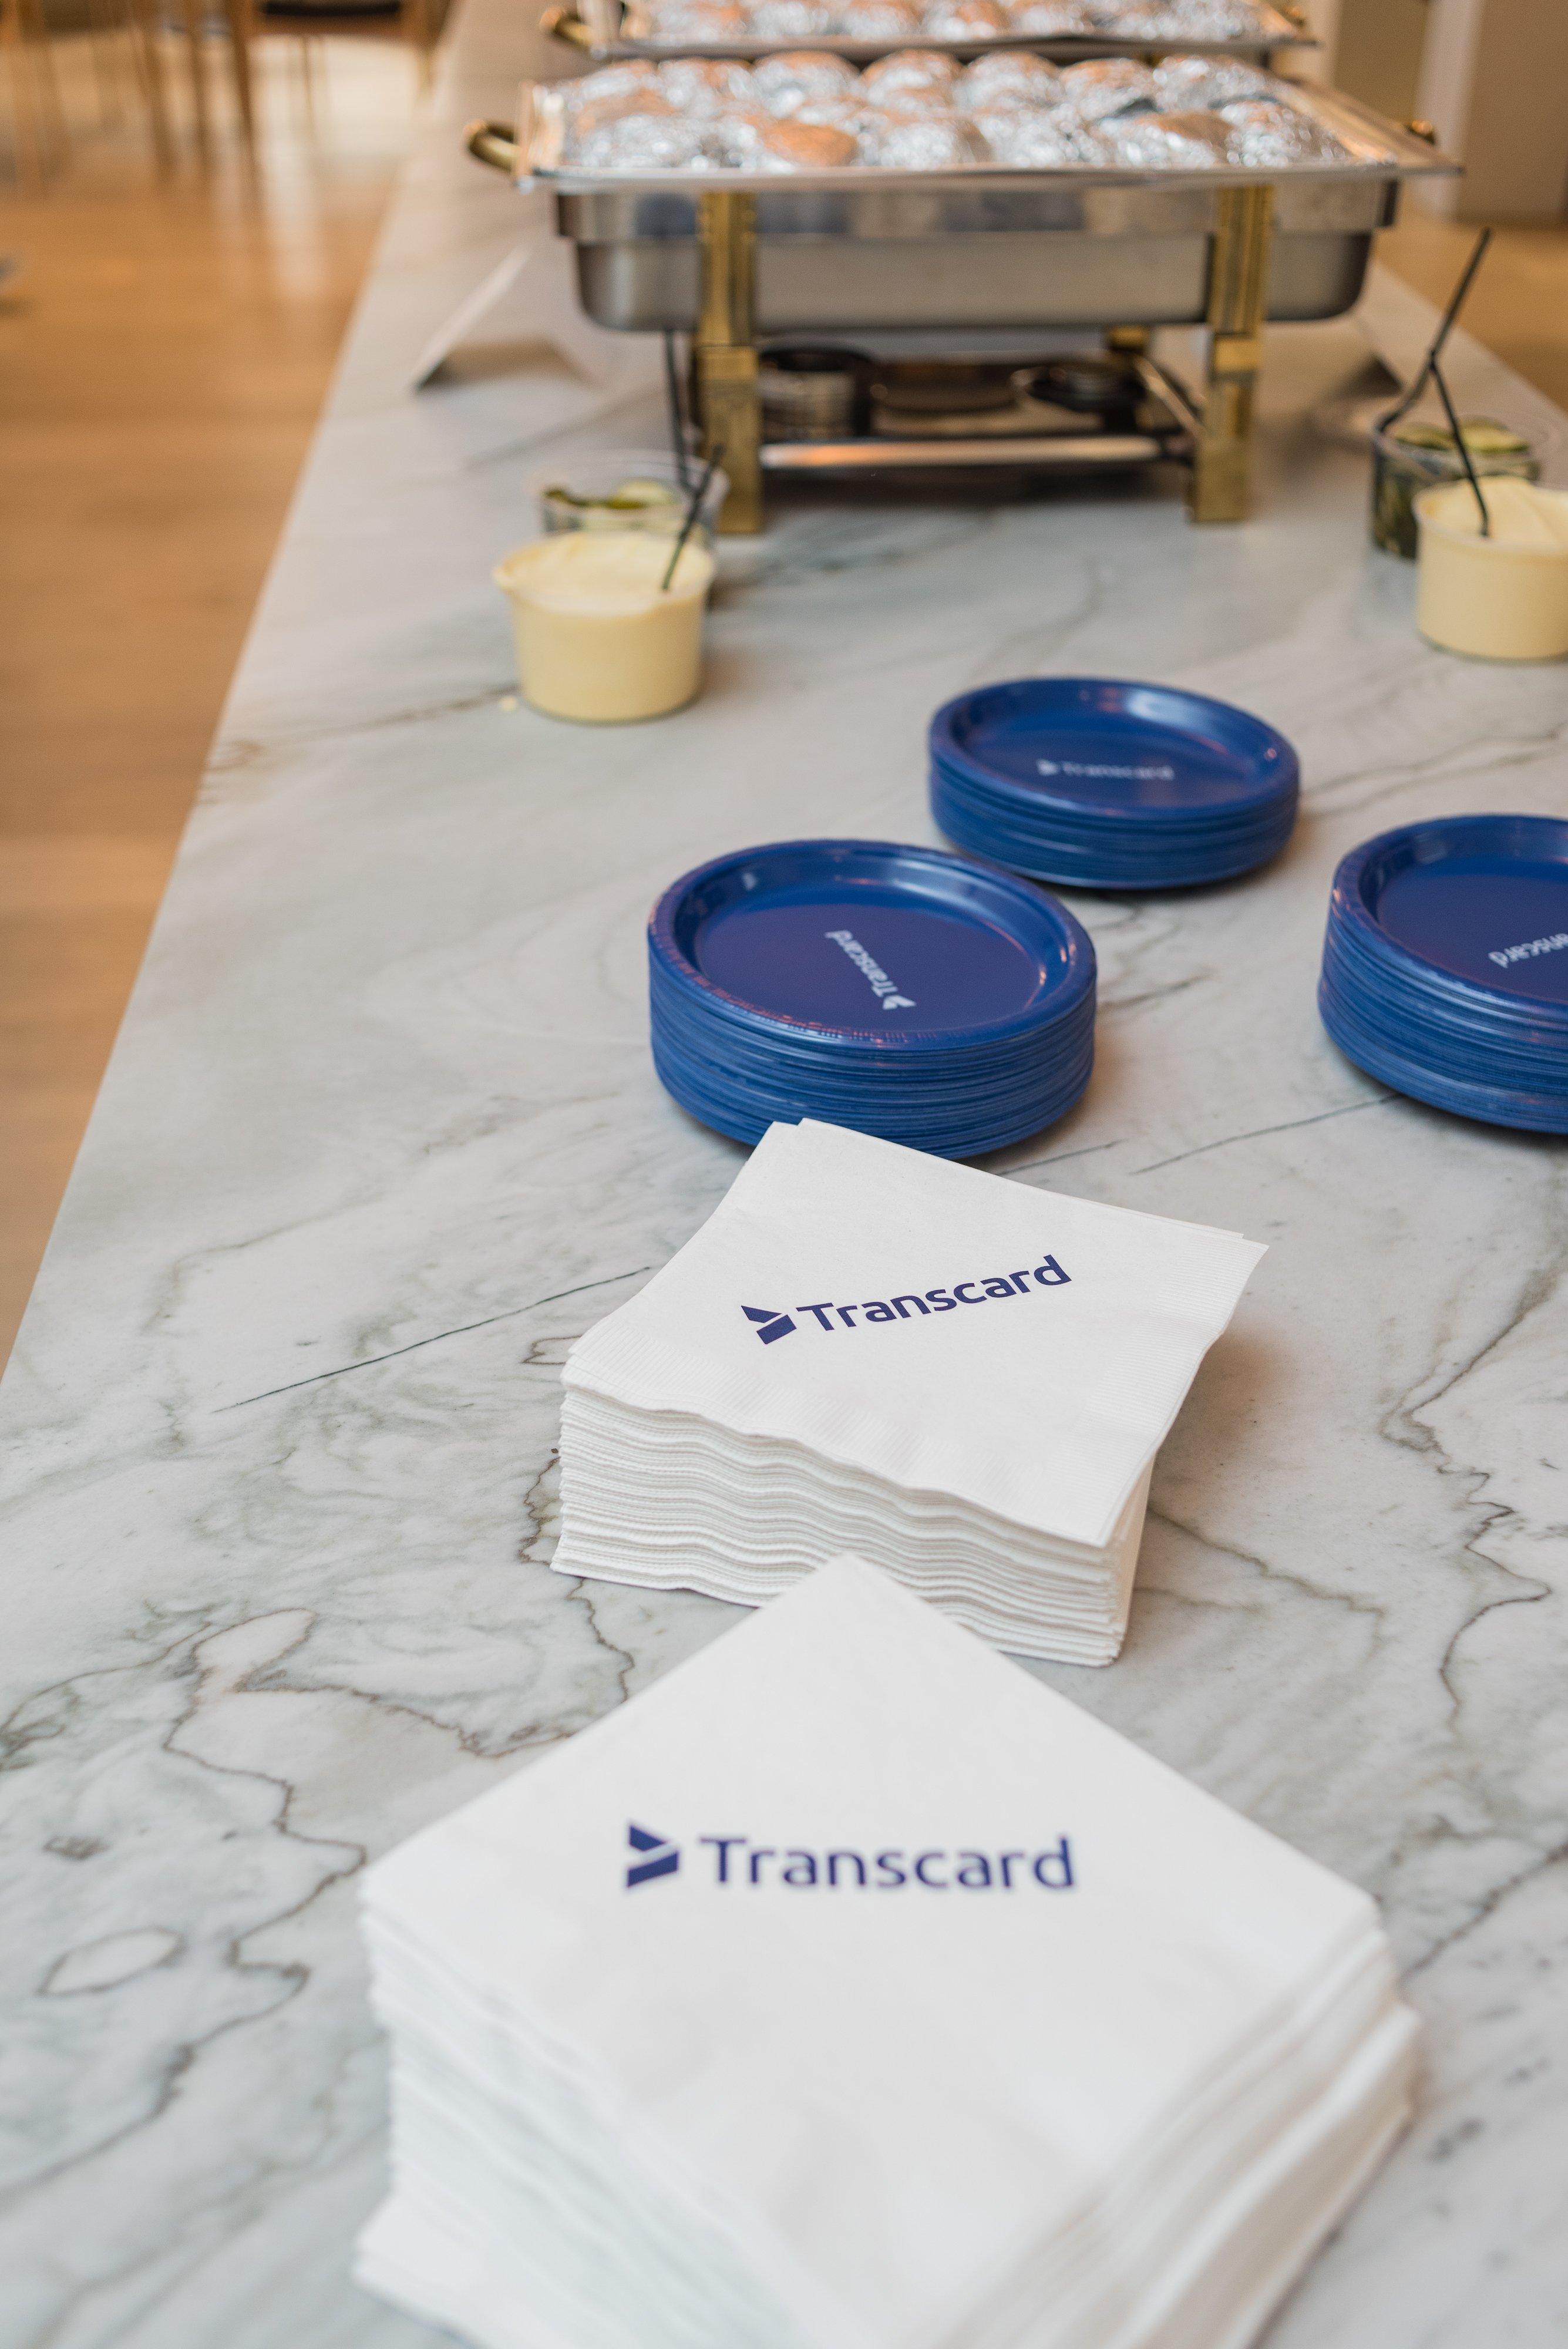 77-transcard-ribbon-cutting-event - Copy